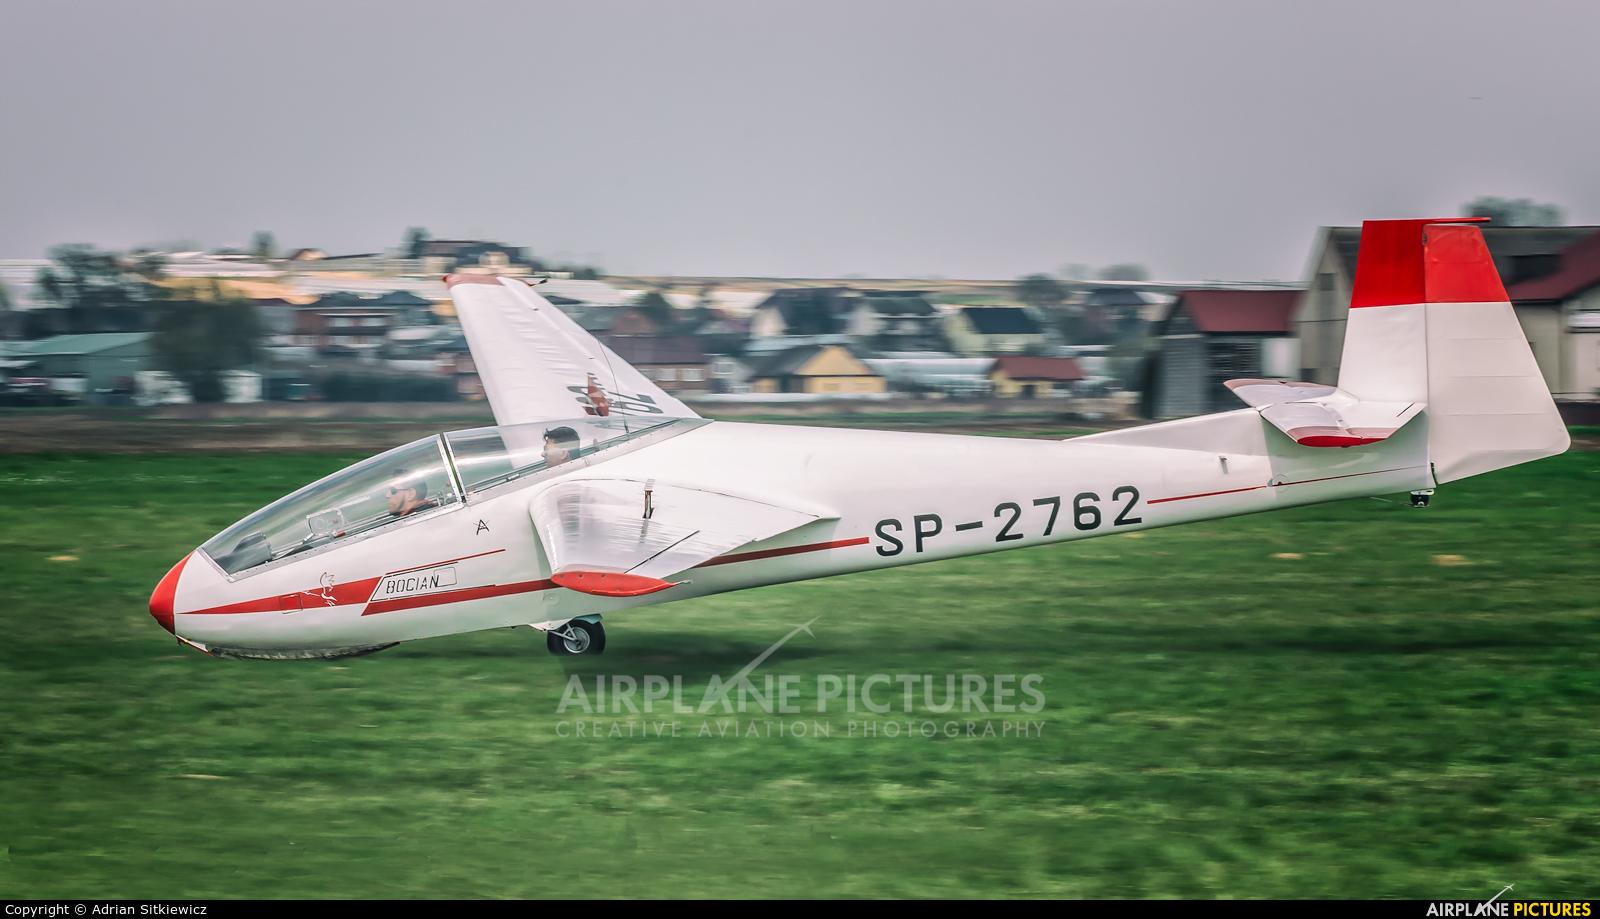 Aeroklub Krakowski SP-2762 aircraft at Kraków - Pobiednik Wielki